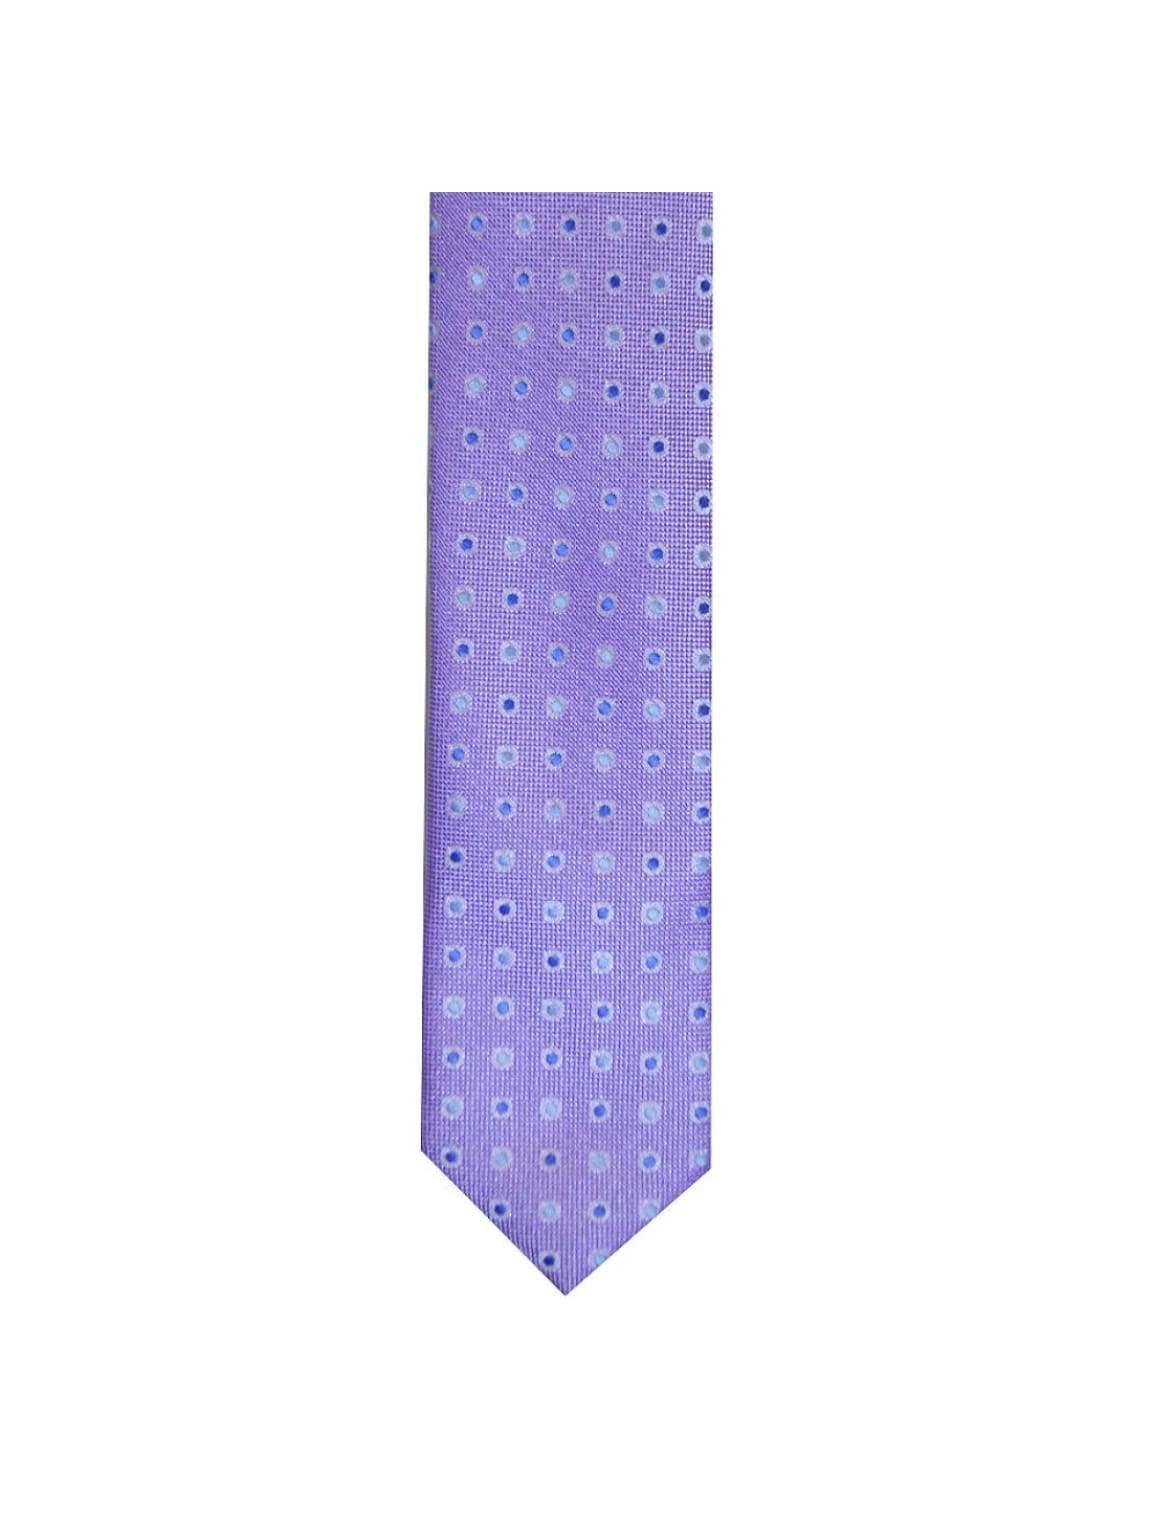 LA Smith Lilac Skinny Polka Dot Tie - Accessories